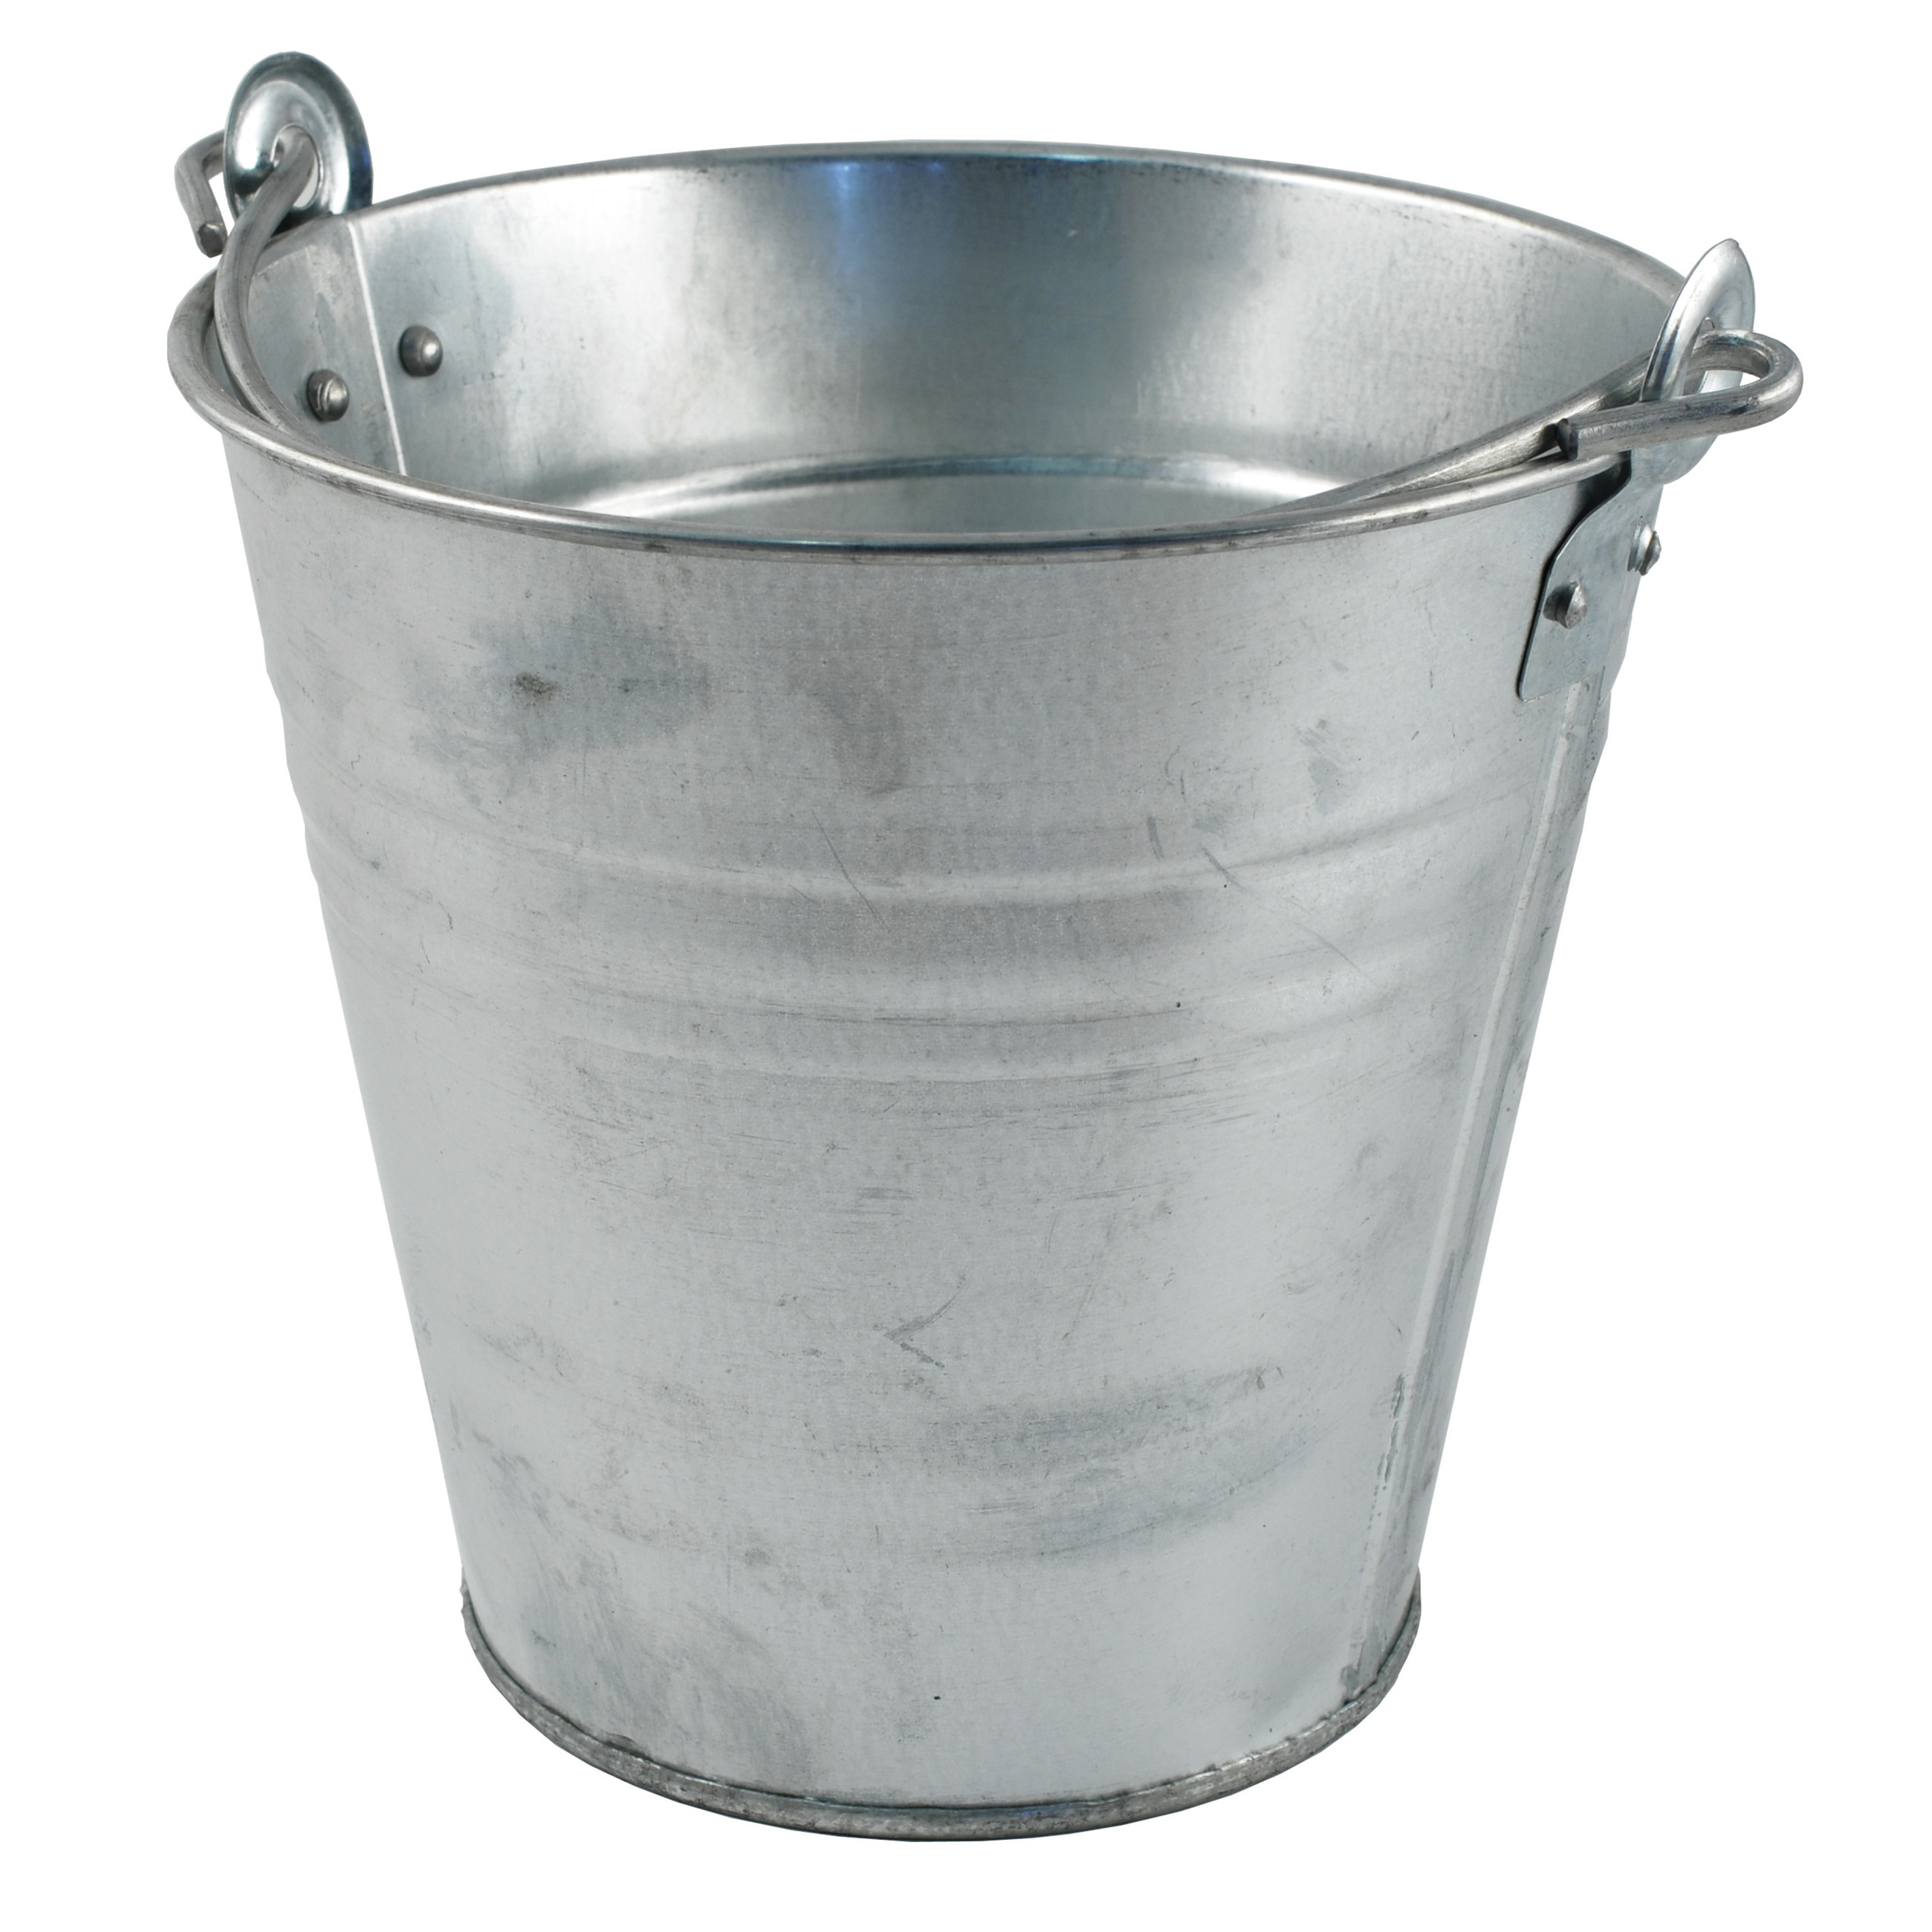 Zinken emmer-bloempot-plantenpot 10 liter